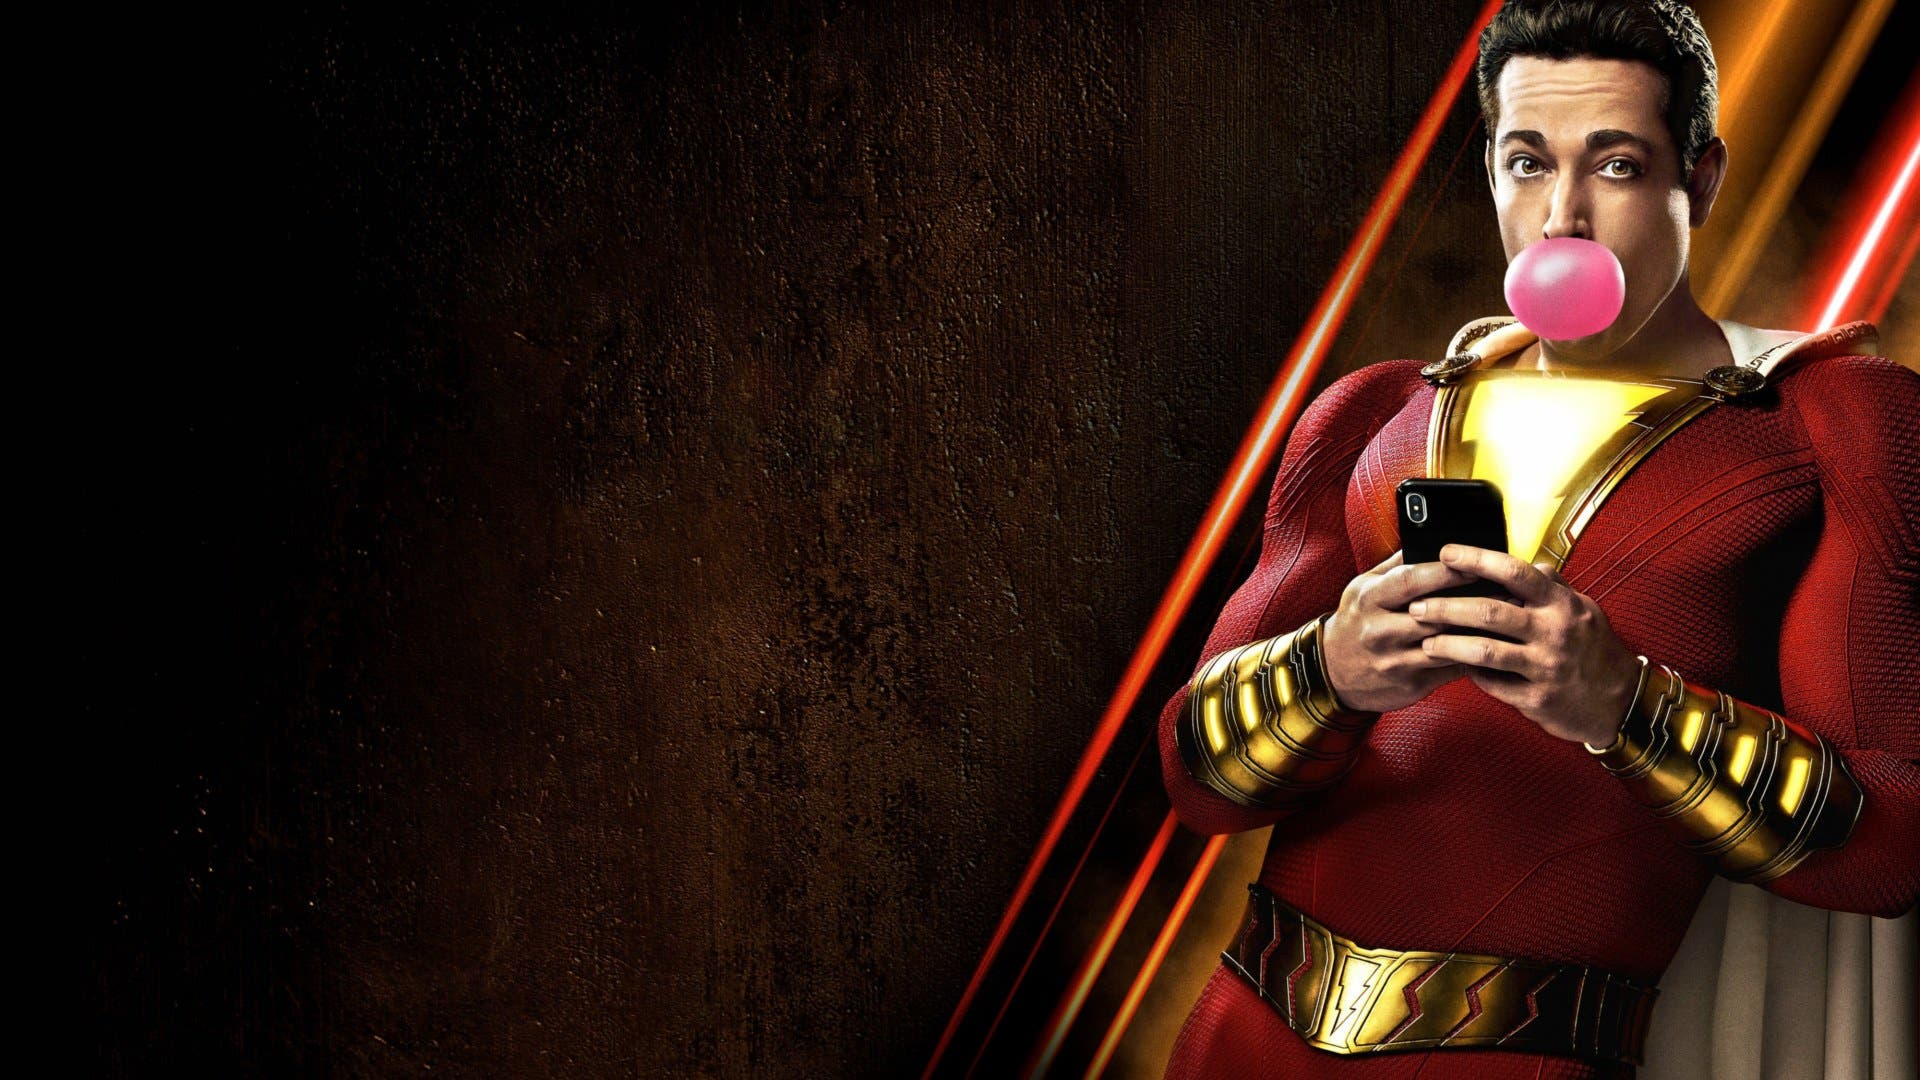 Imagen de ¡Shazam! pasa su primer fin de semana con más de 150 millones a nivel mundial